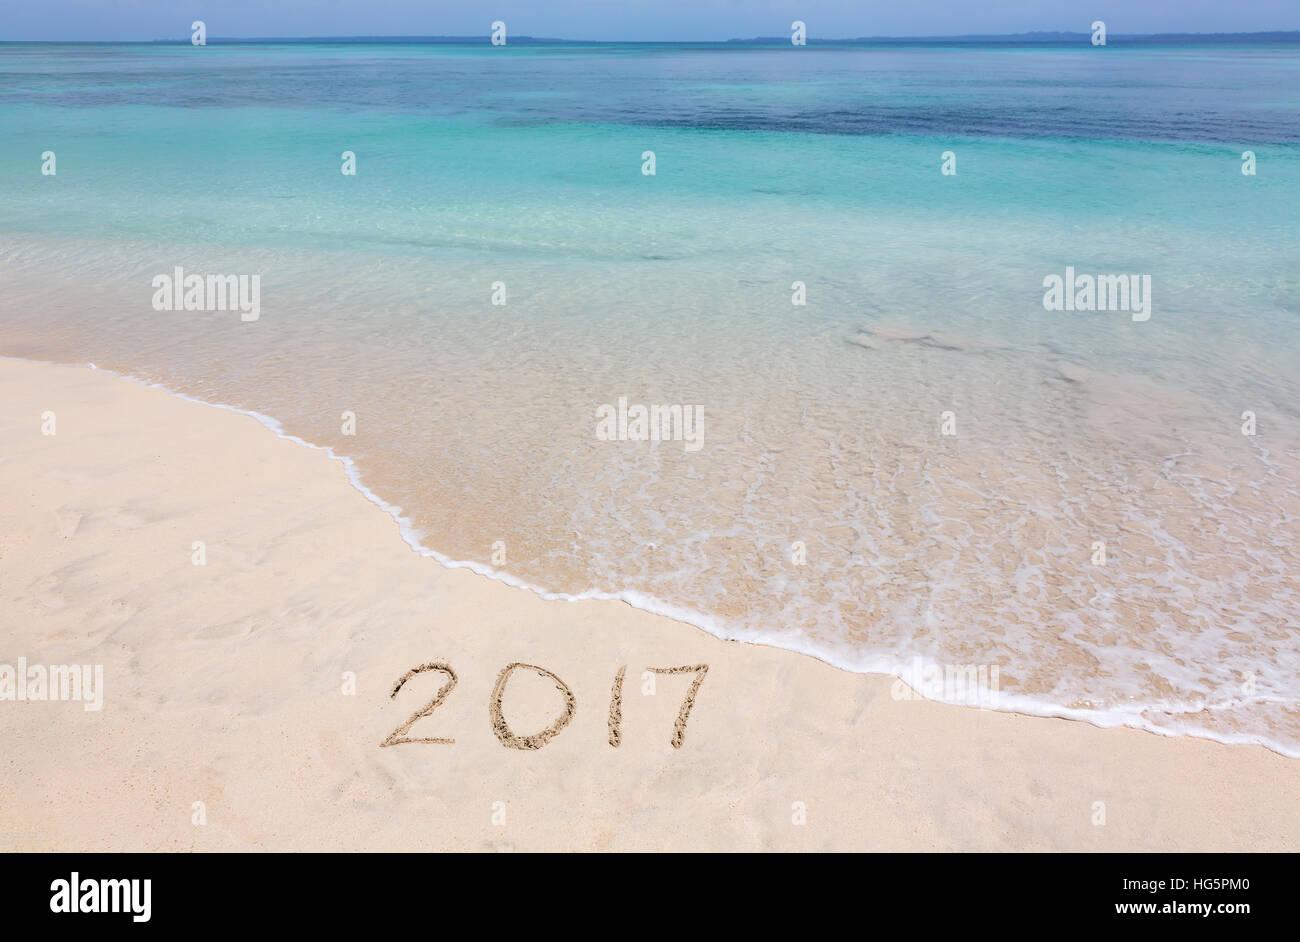 Happy New Year 2017 creative on the beach - Stock Image